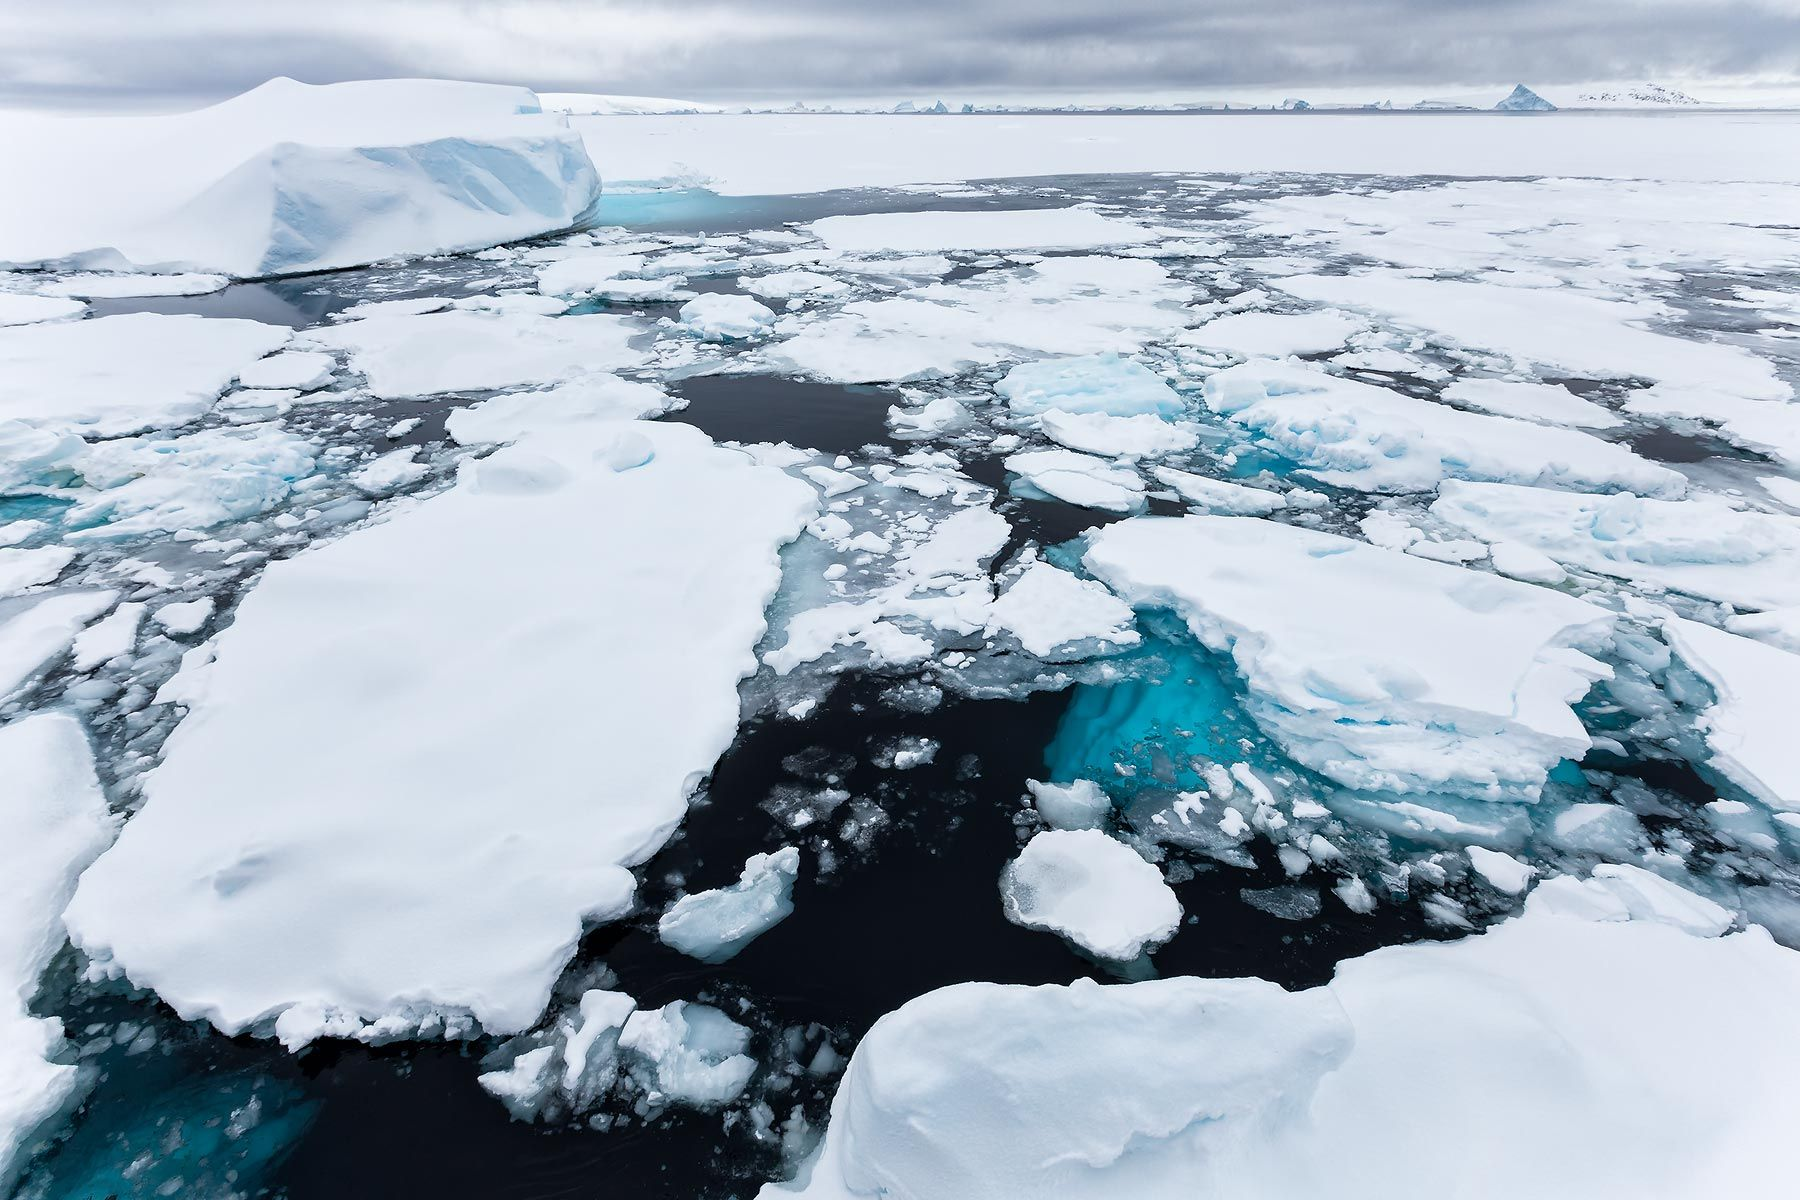 Sea-ice-near-Booth-Island_S6A5776-Lemaire-Channel,-Gerlache-Strait,-Antarctica.jpg